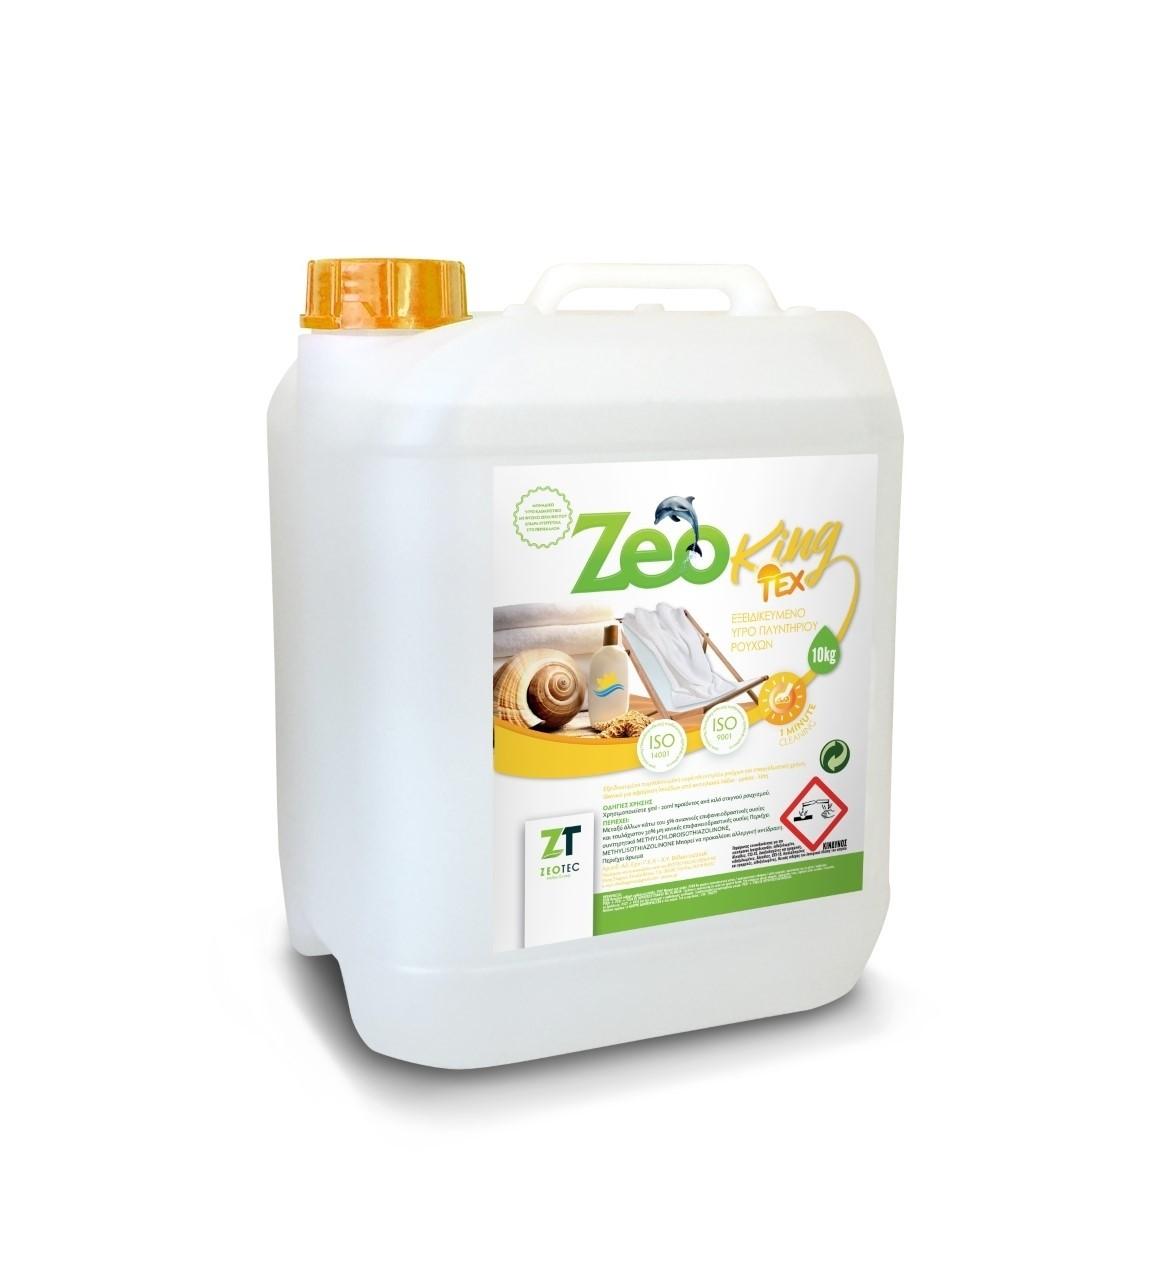 Zeo King Tex - Ενισχυτικό υγρό πλυντηρίου ρούχων 10lt